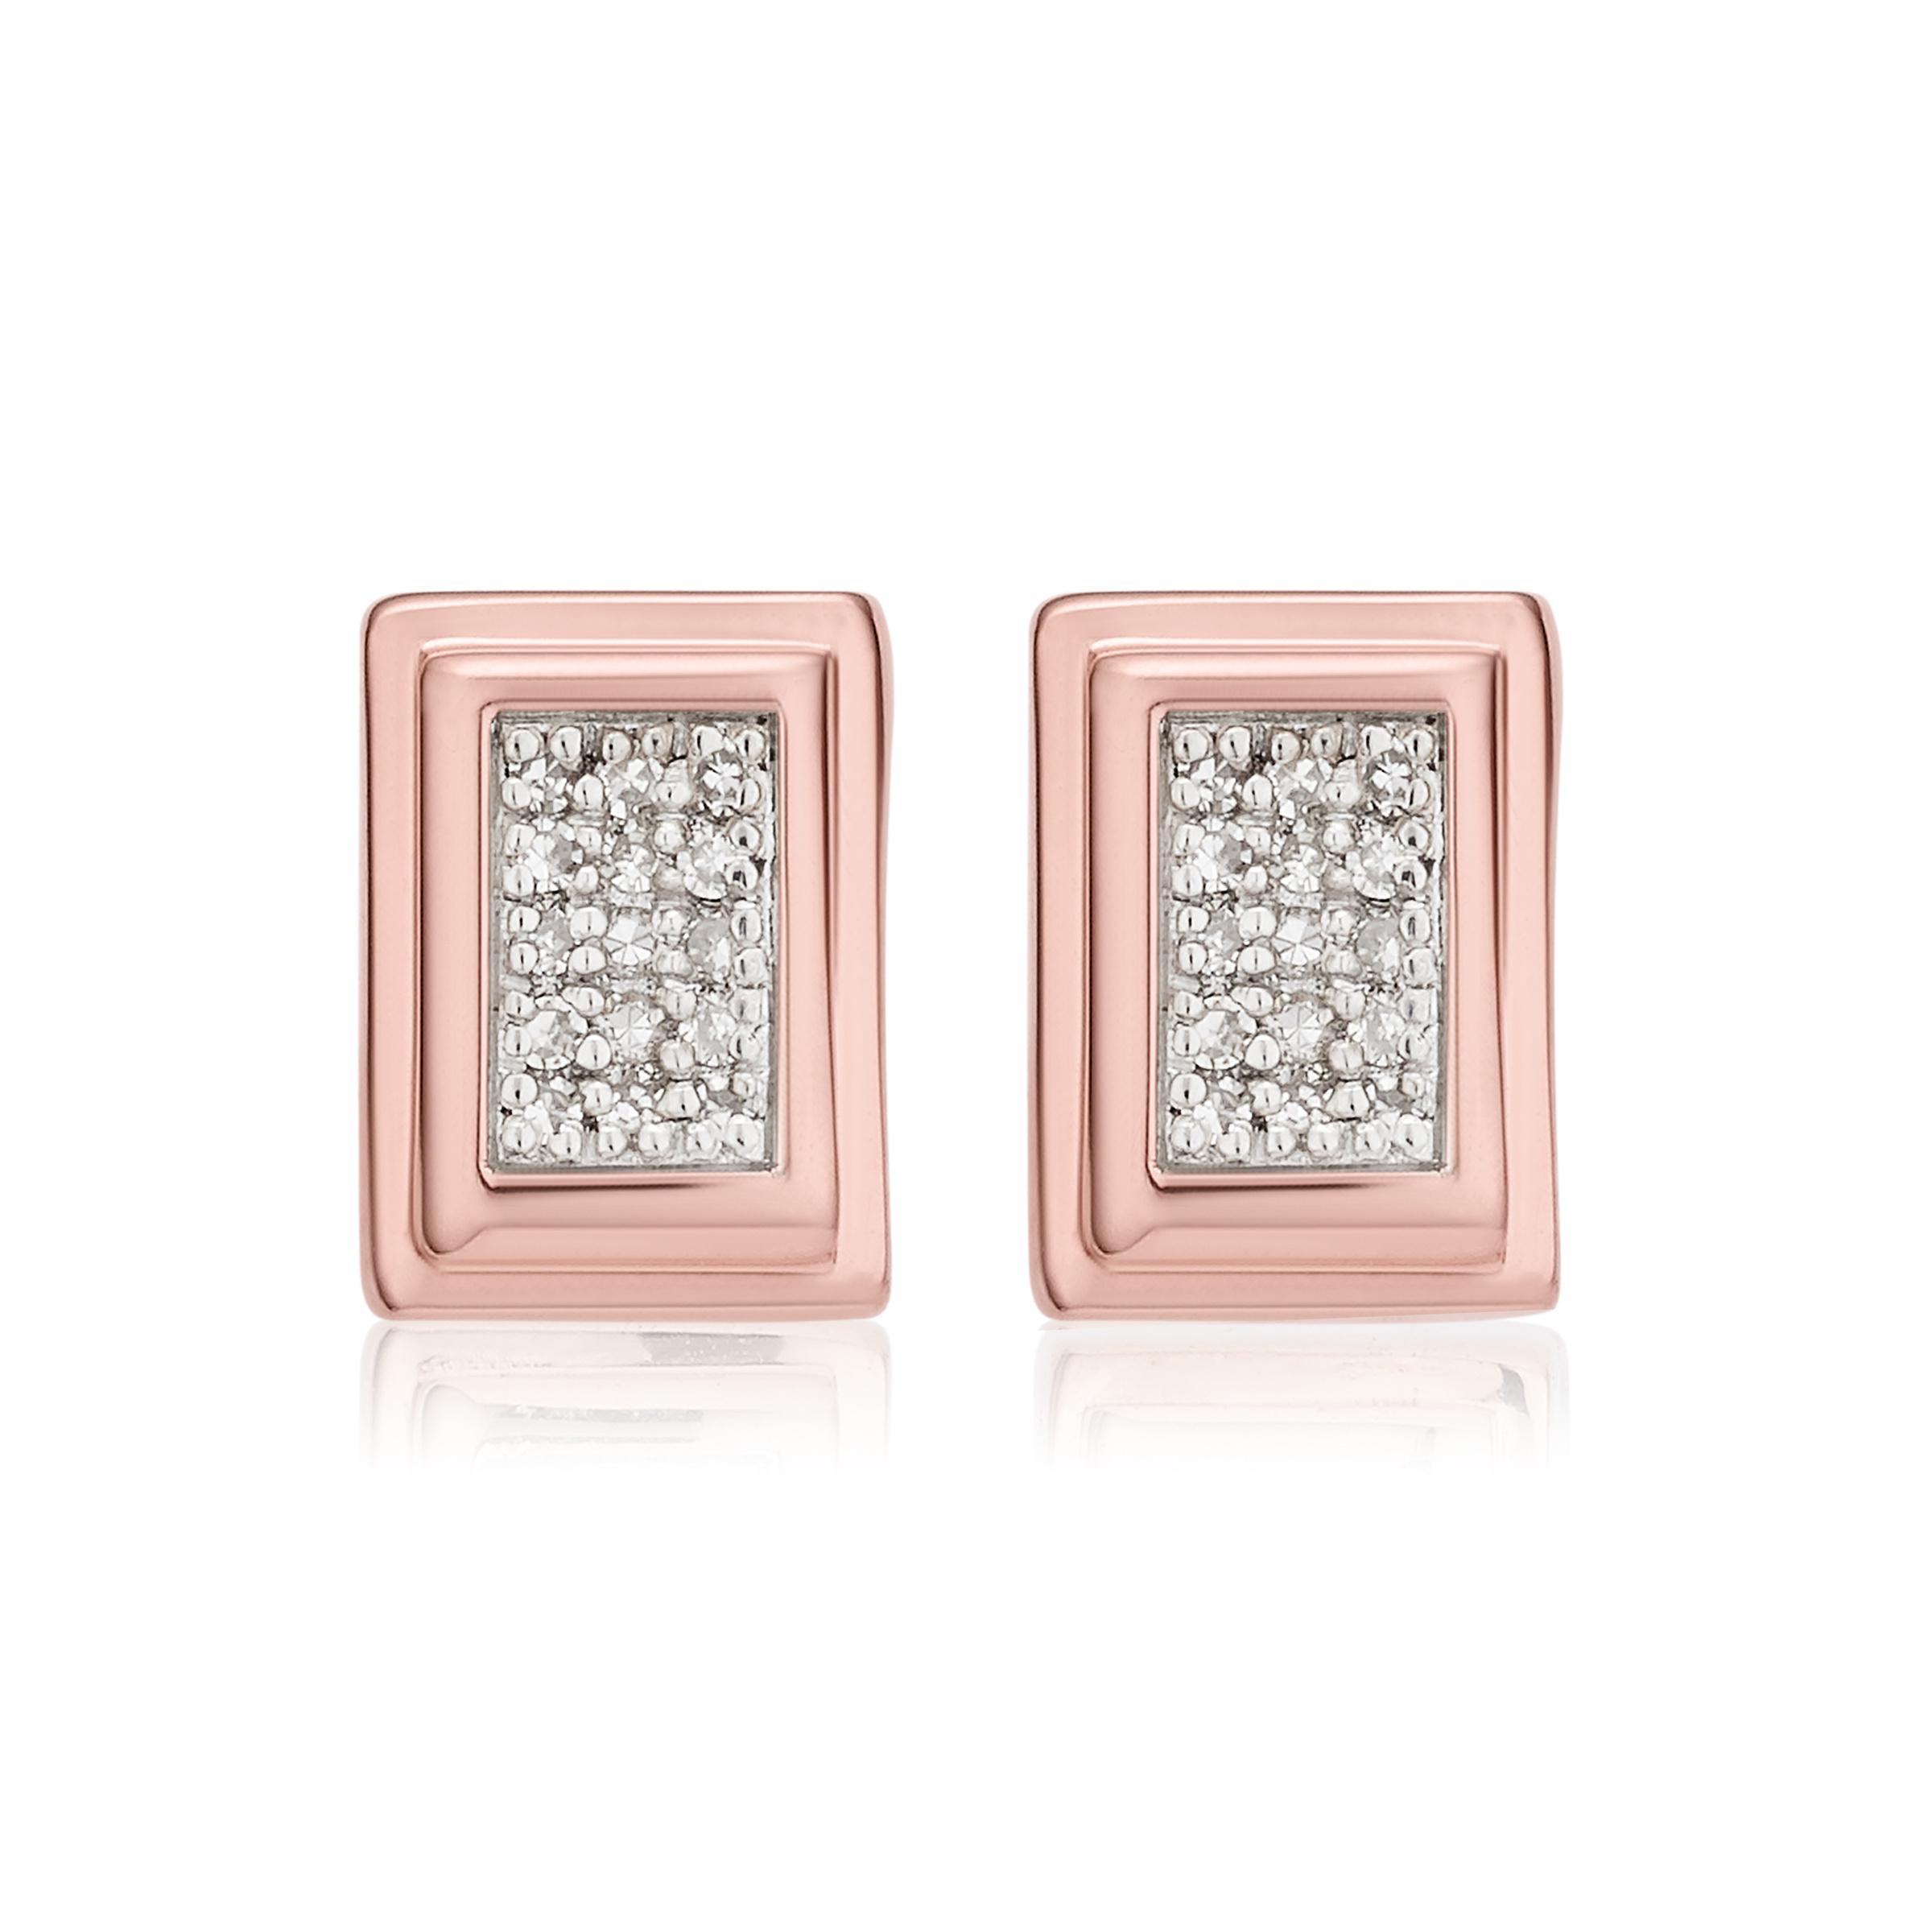 Rose Gold Baja Deco Stud Diamond Earrings Diamond Monica Vinader fMhPV